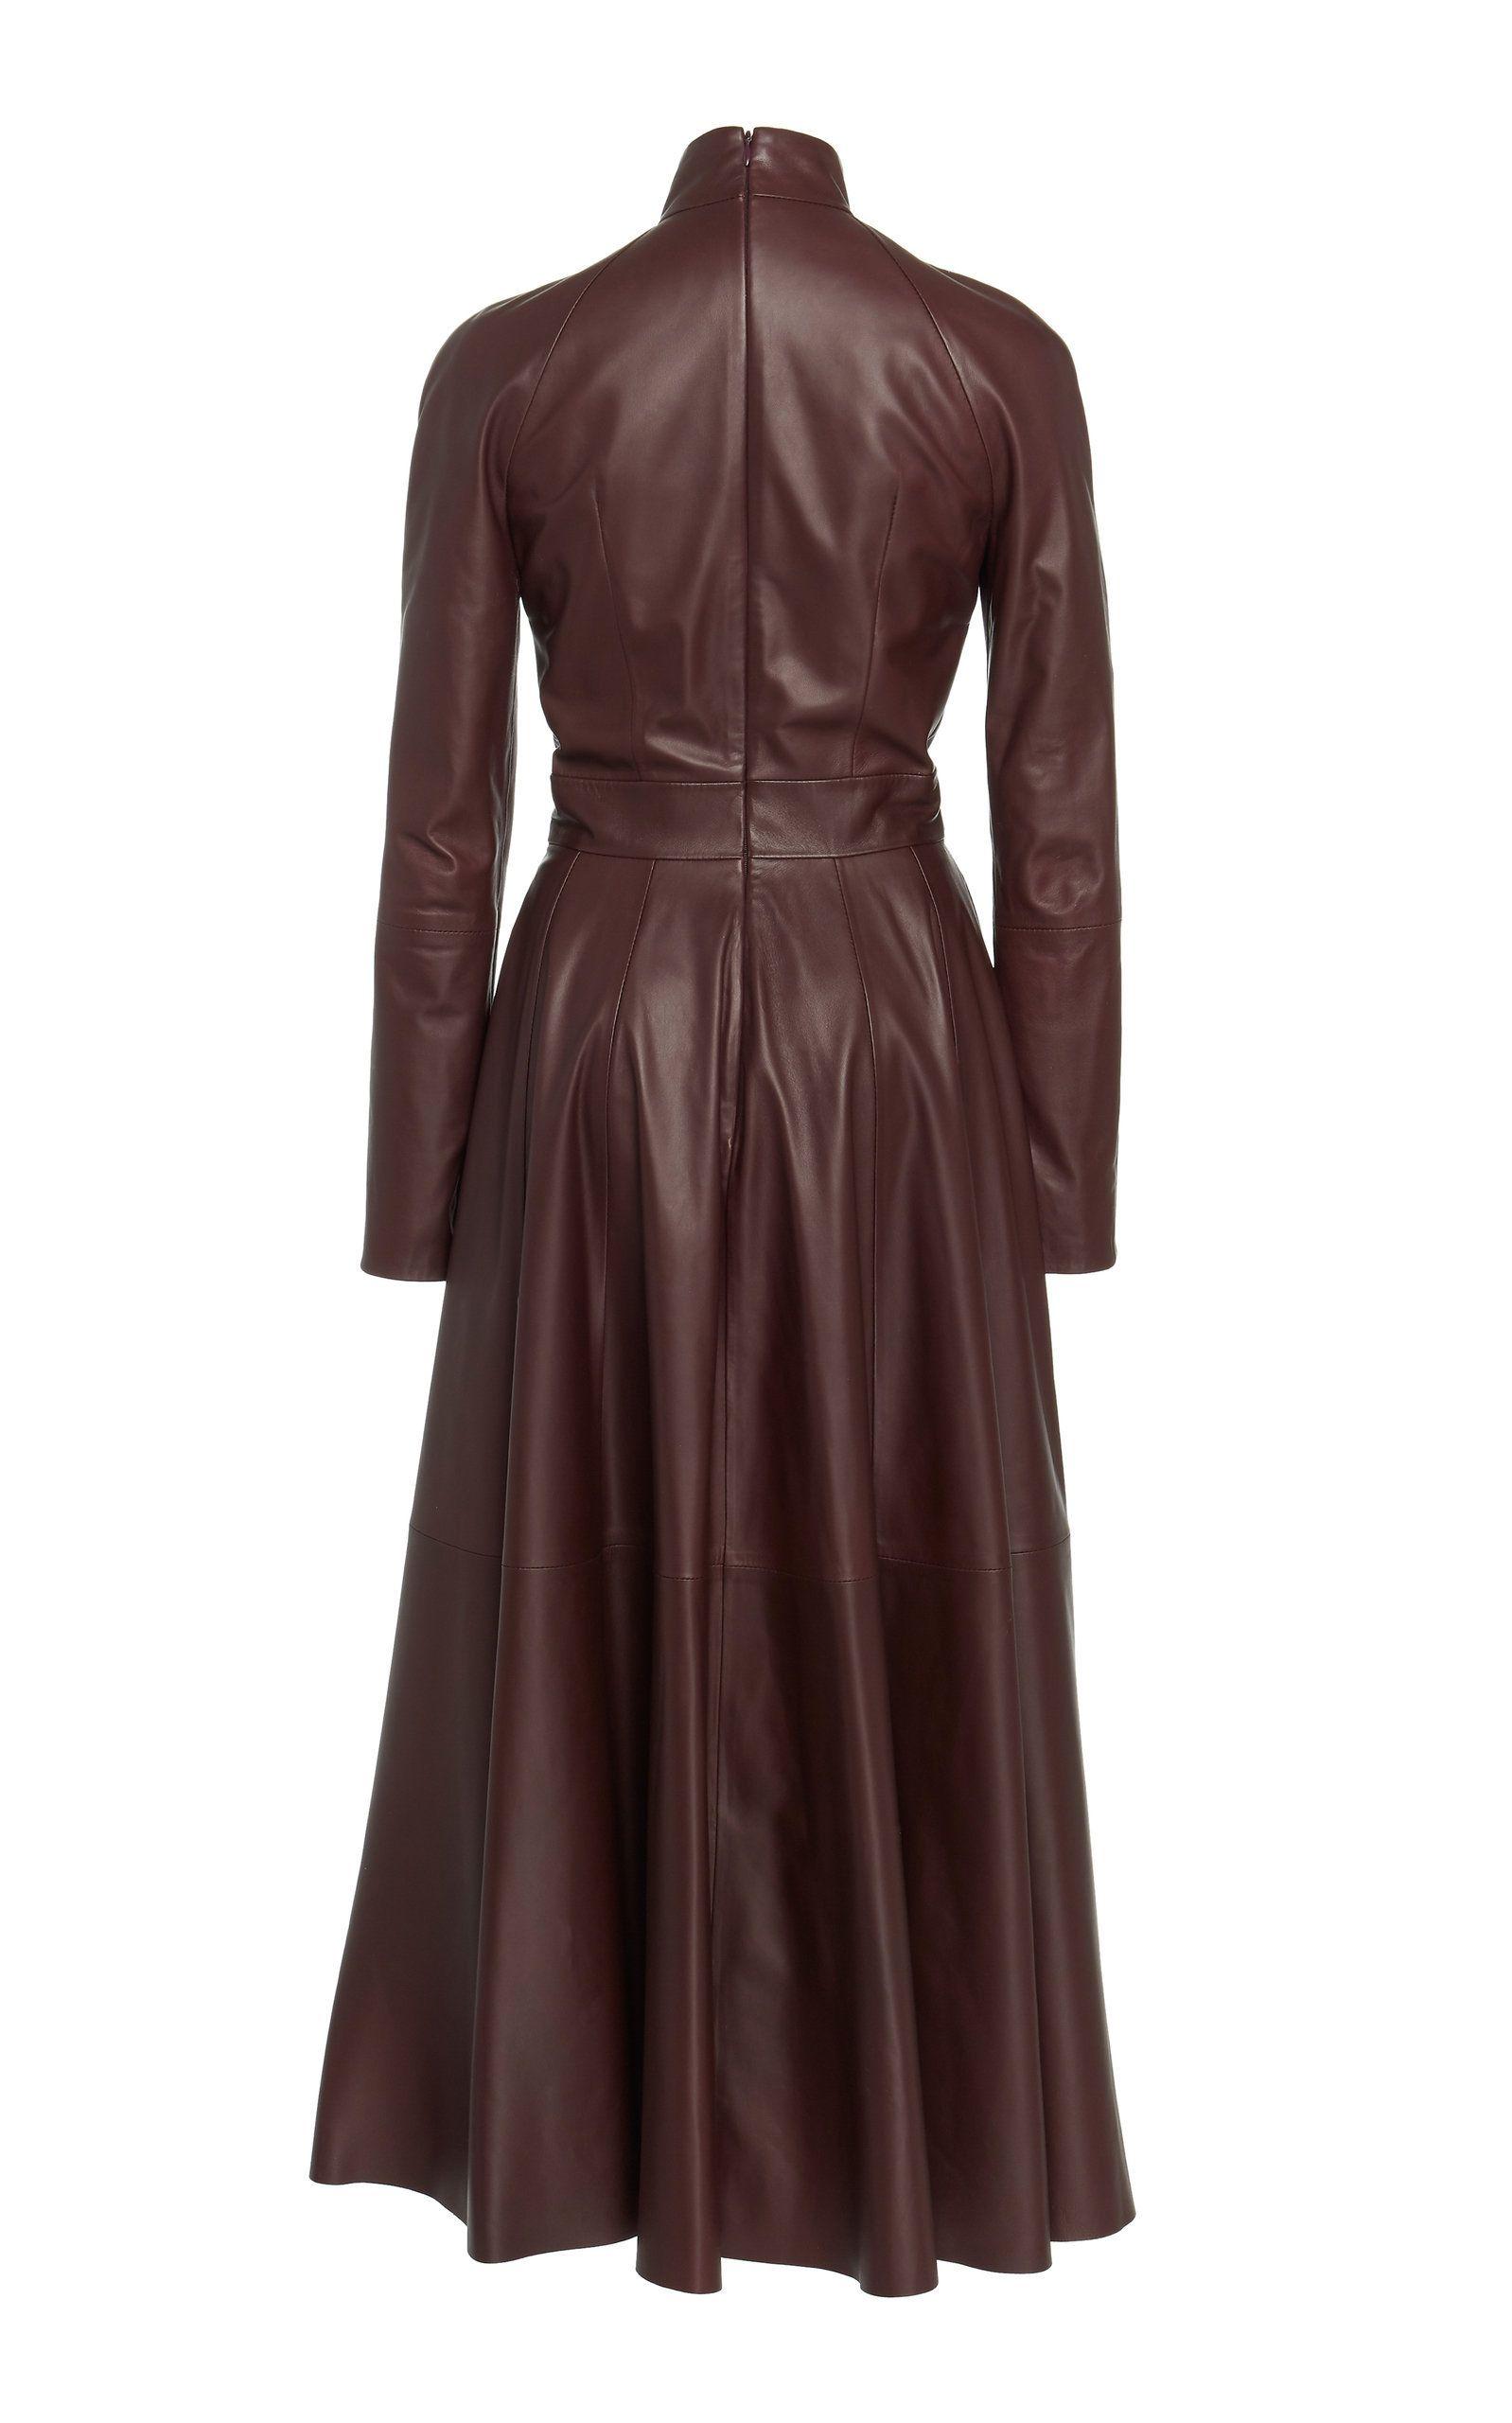 3577c62b6ea Zimmermann Resistance Pleated Leather Dress in 2019